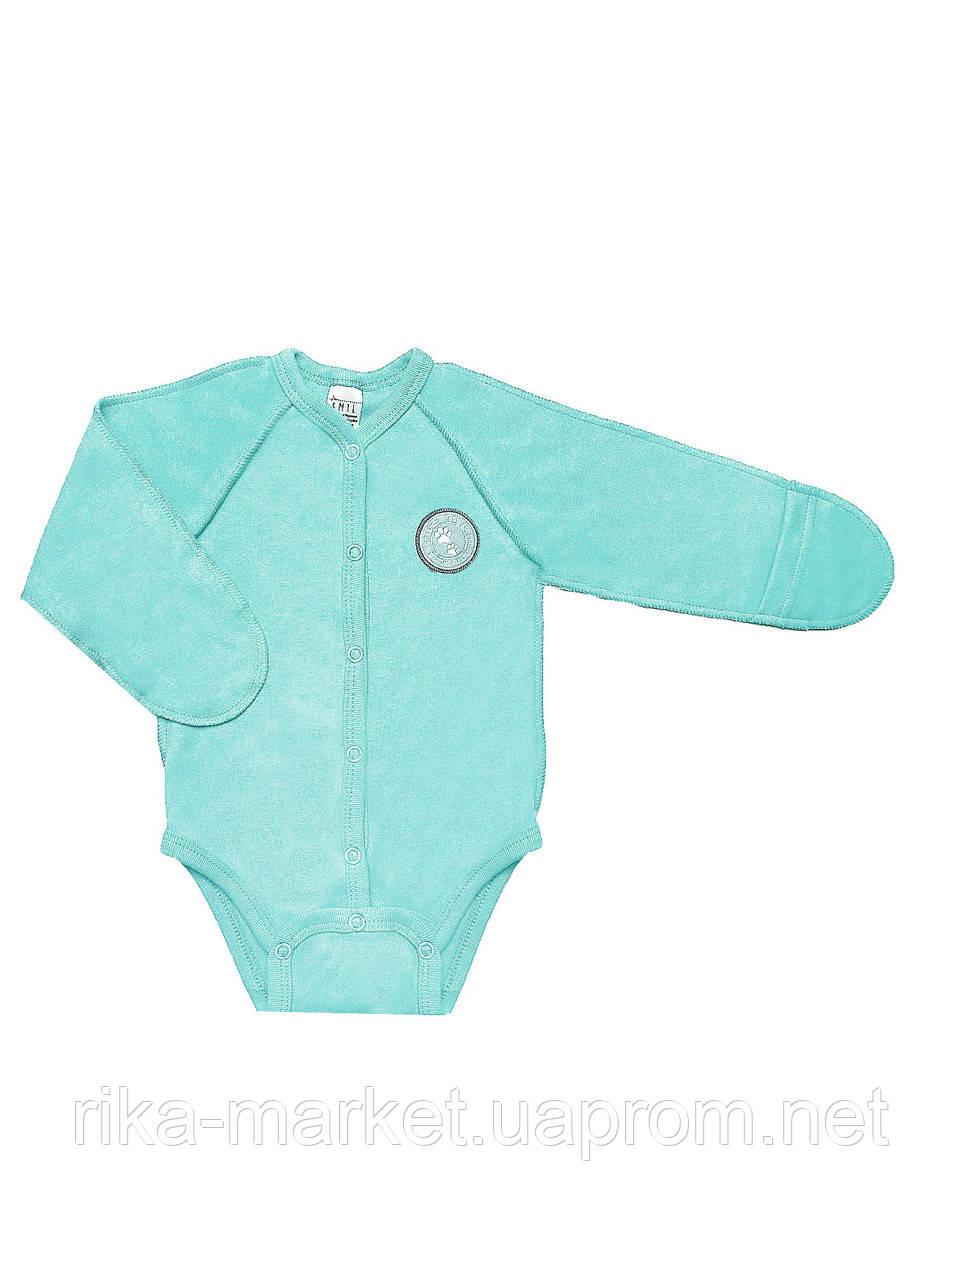 Боди-футболка для мальчика ТМ Смил, арт. 102487,   1-3 месяцев